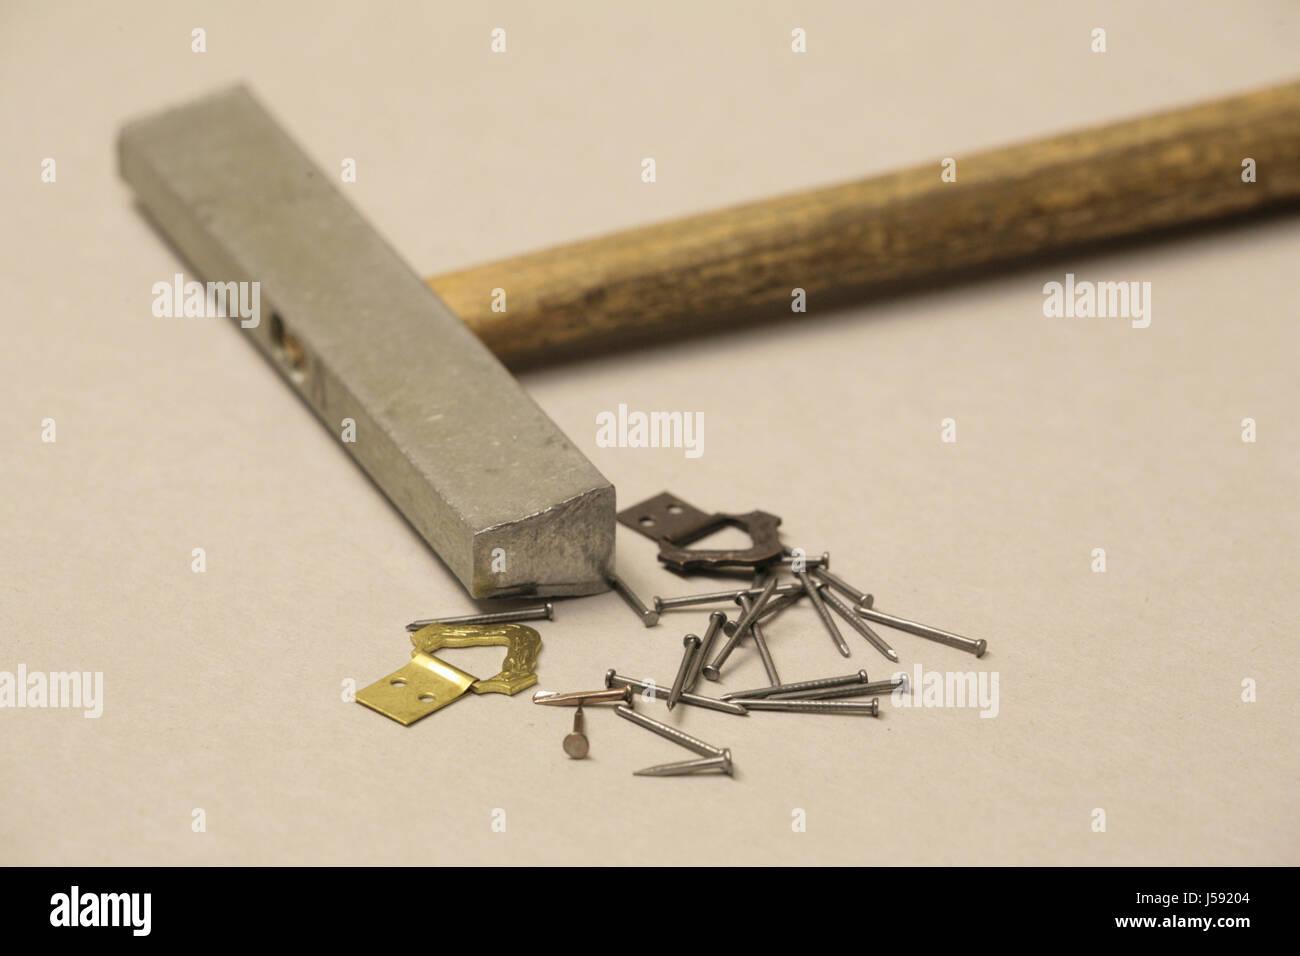 Still Life Tool Metal Nail Handicraft Materials Sledges Work Job